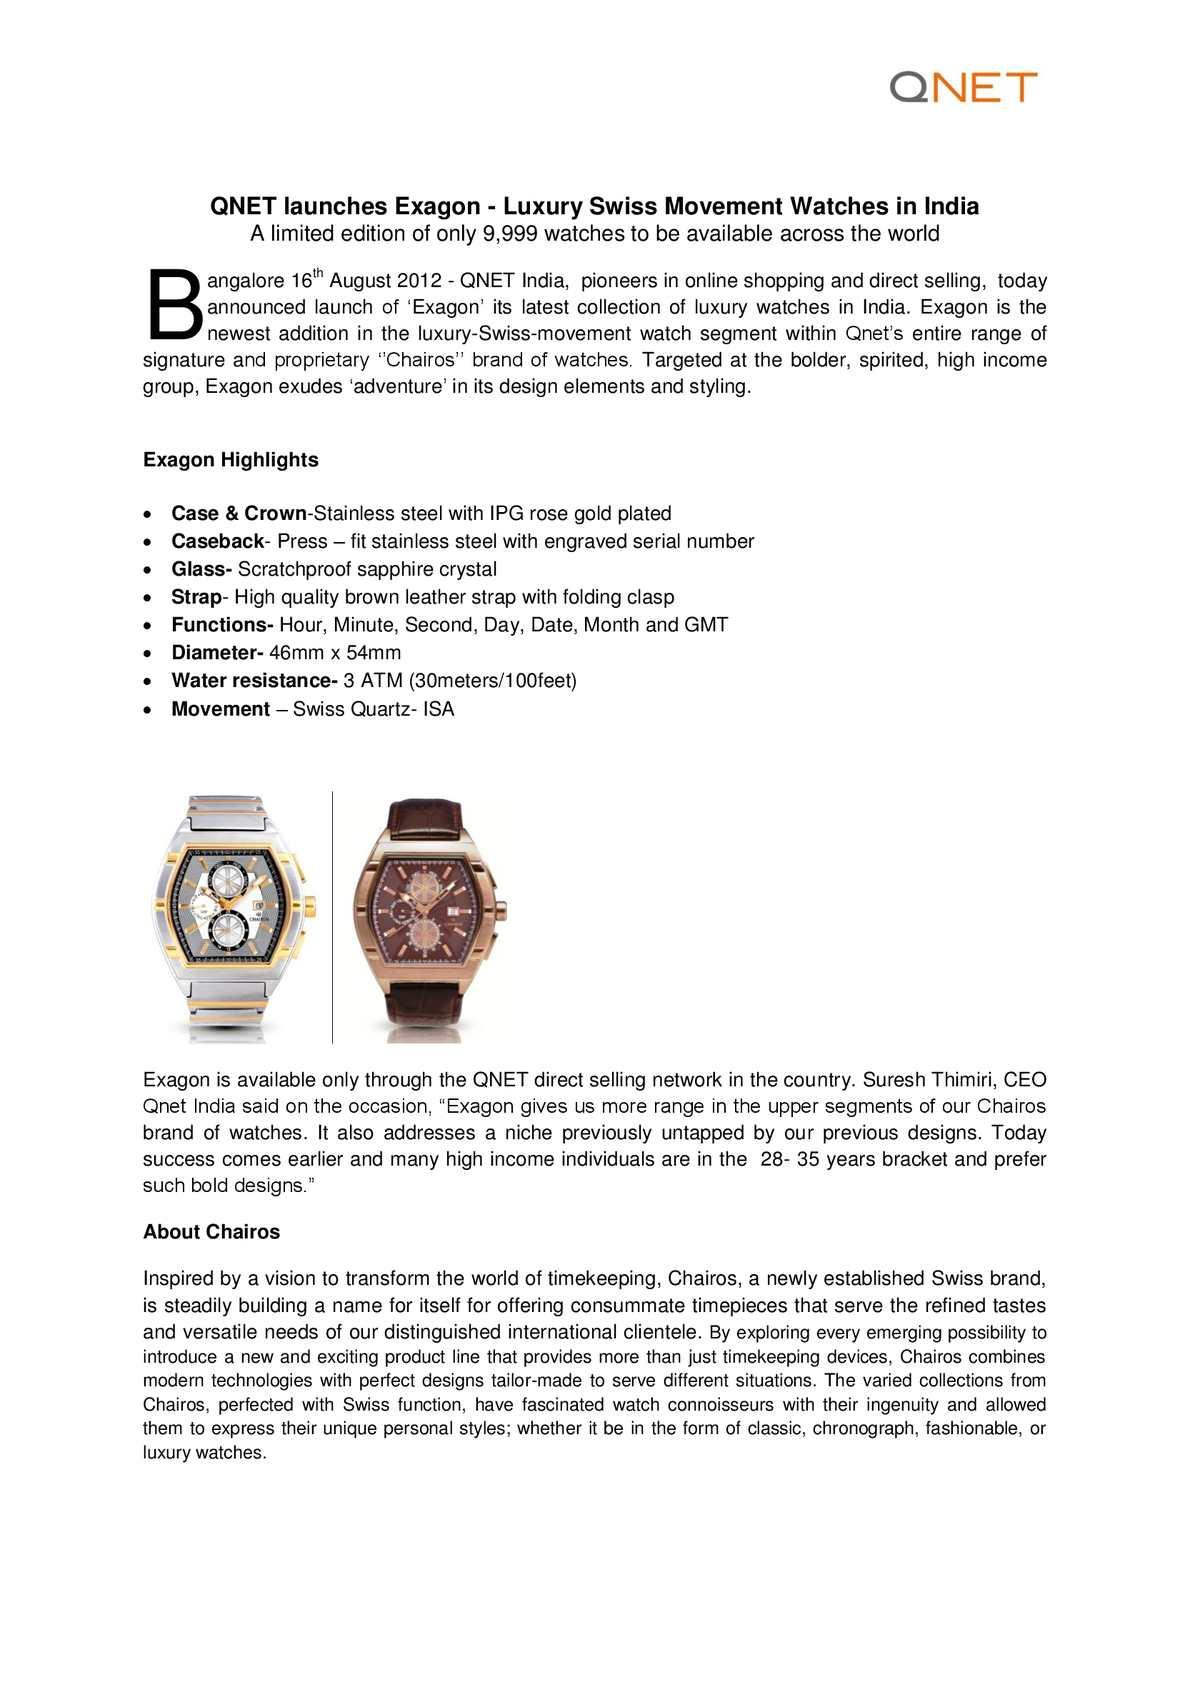 Calaméo - Exagon Launch Press Release August 2012